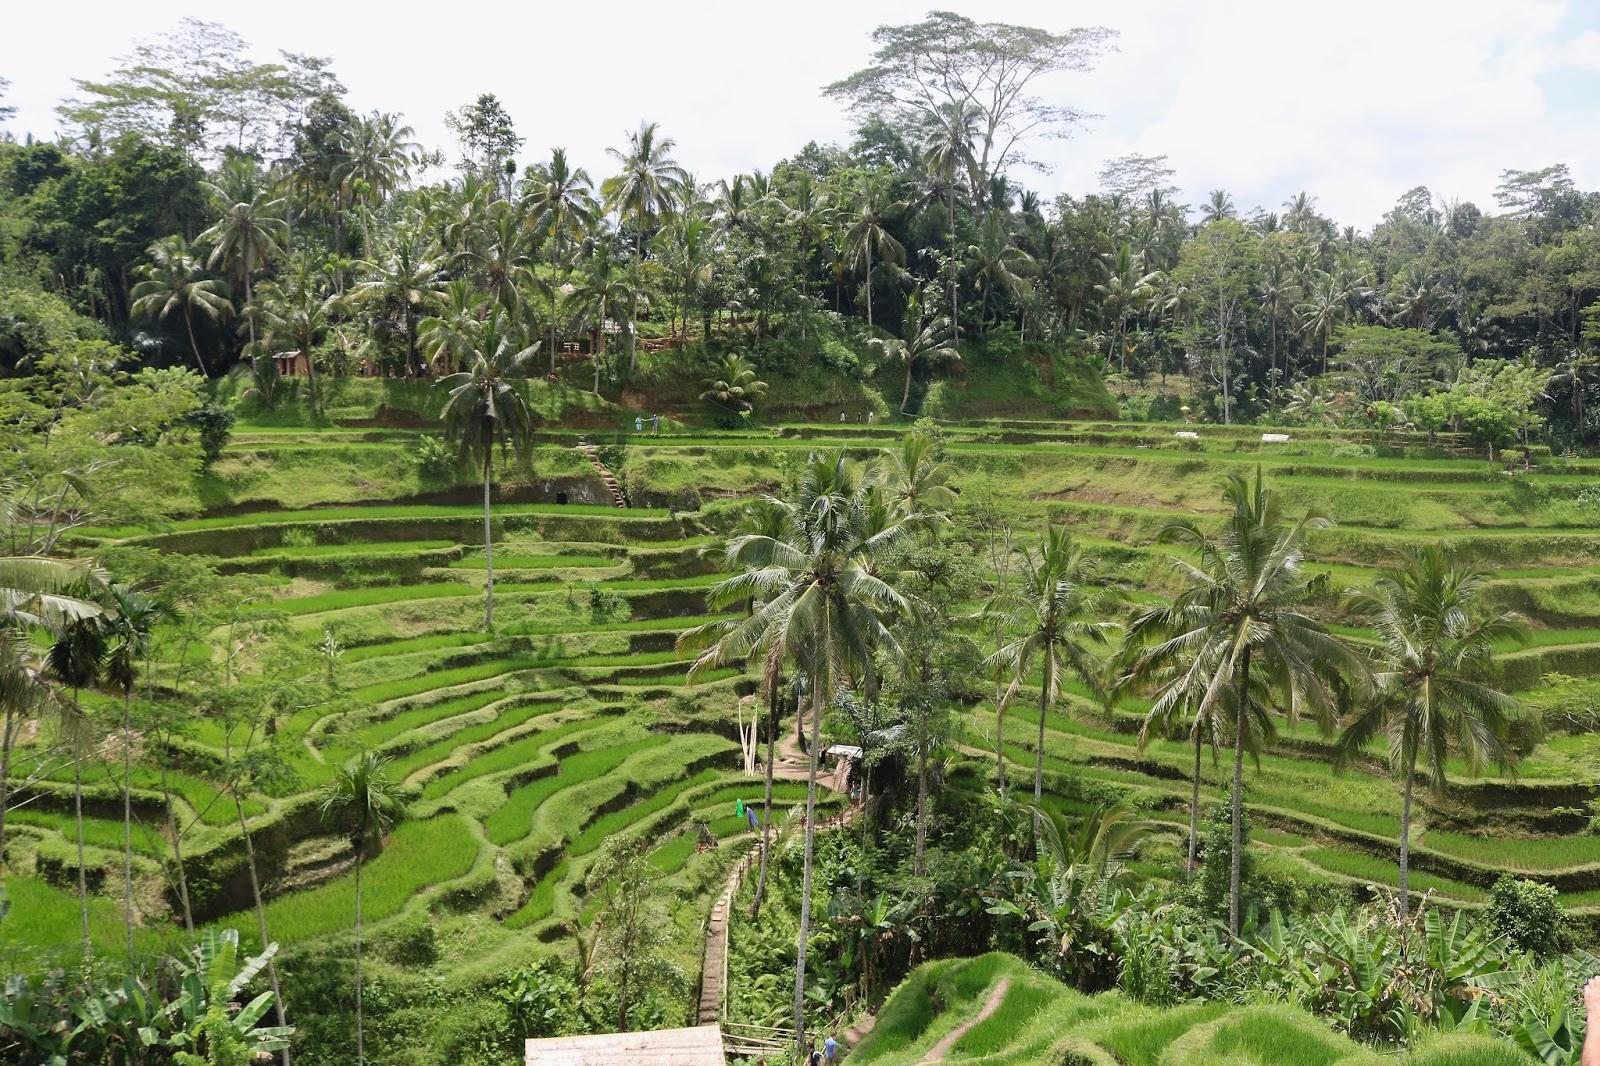 bali tegalalang rice terraces